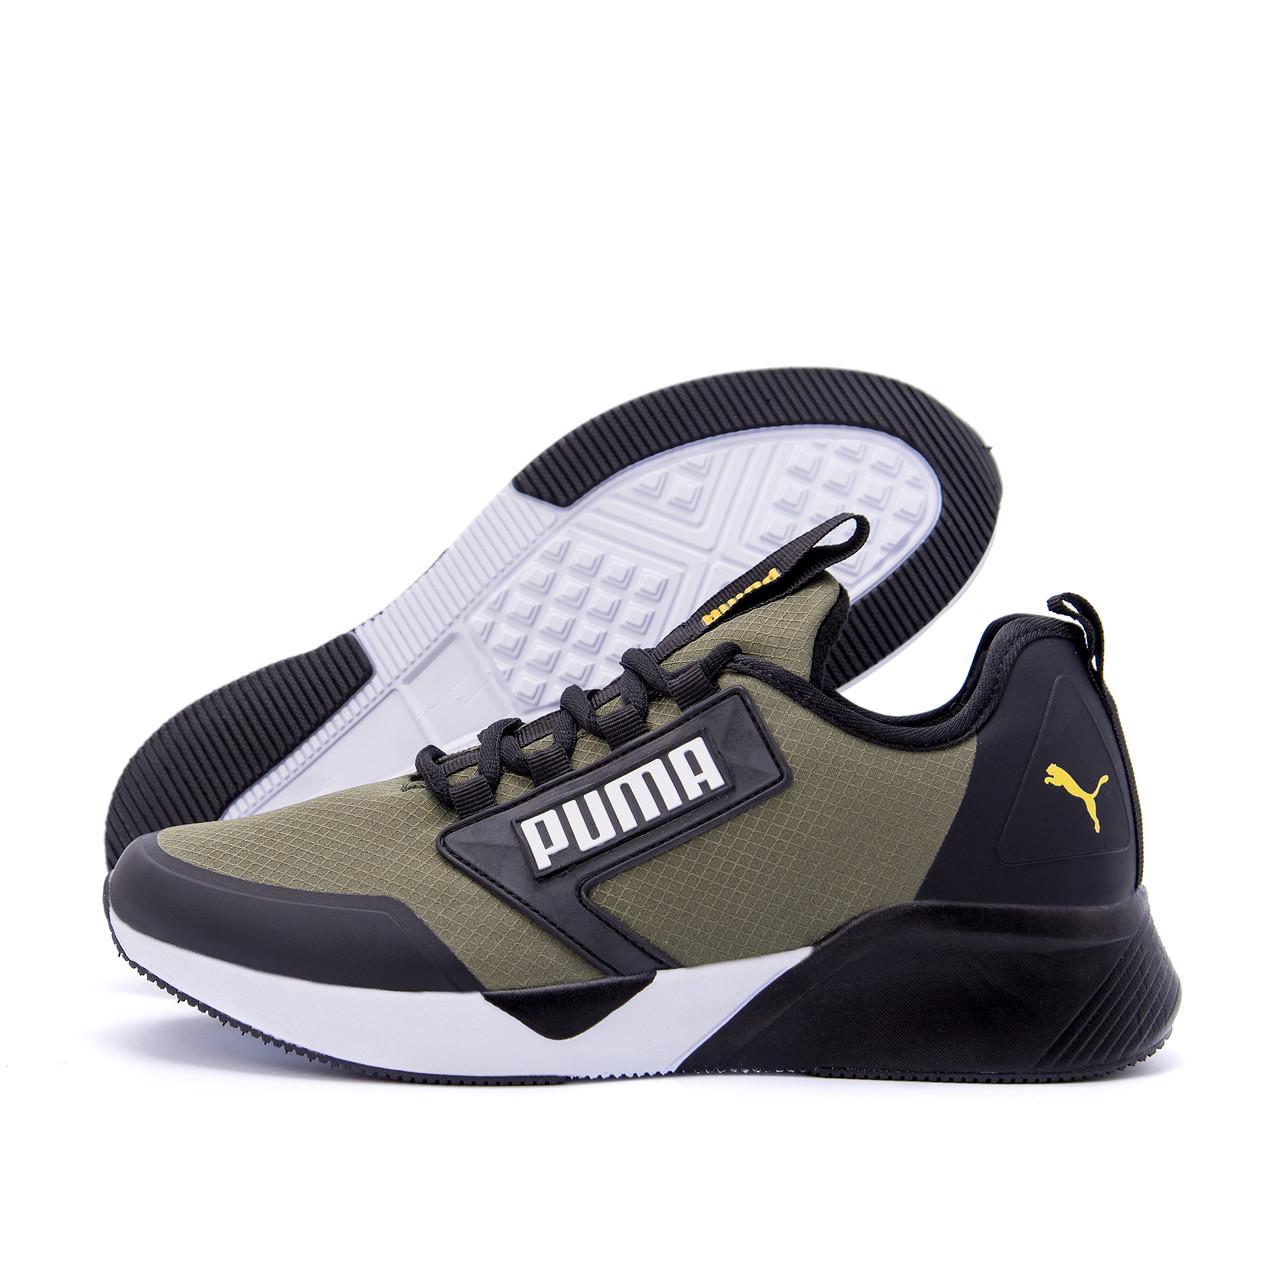 Мужские кроссовки Puma Retaliate Green  GORE-Tex утепление